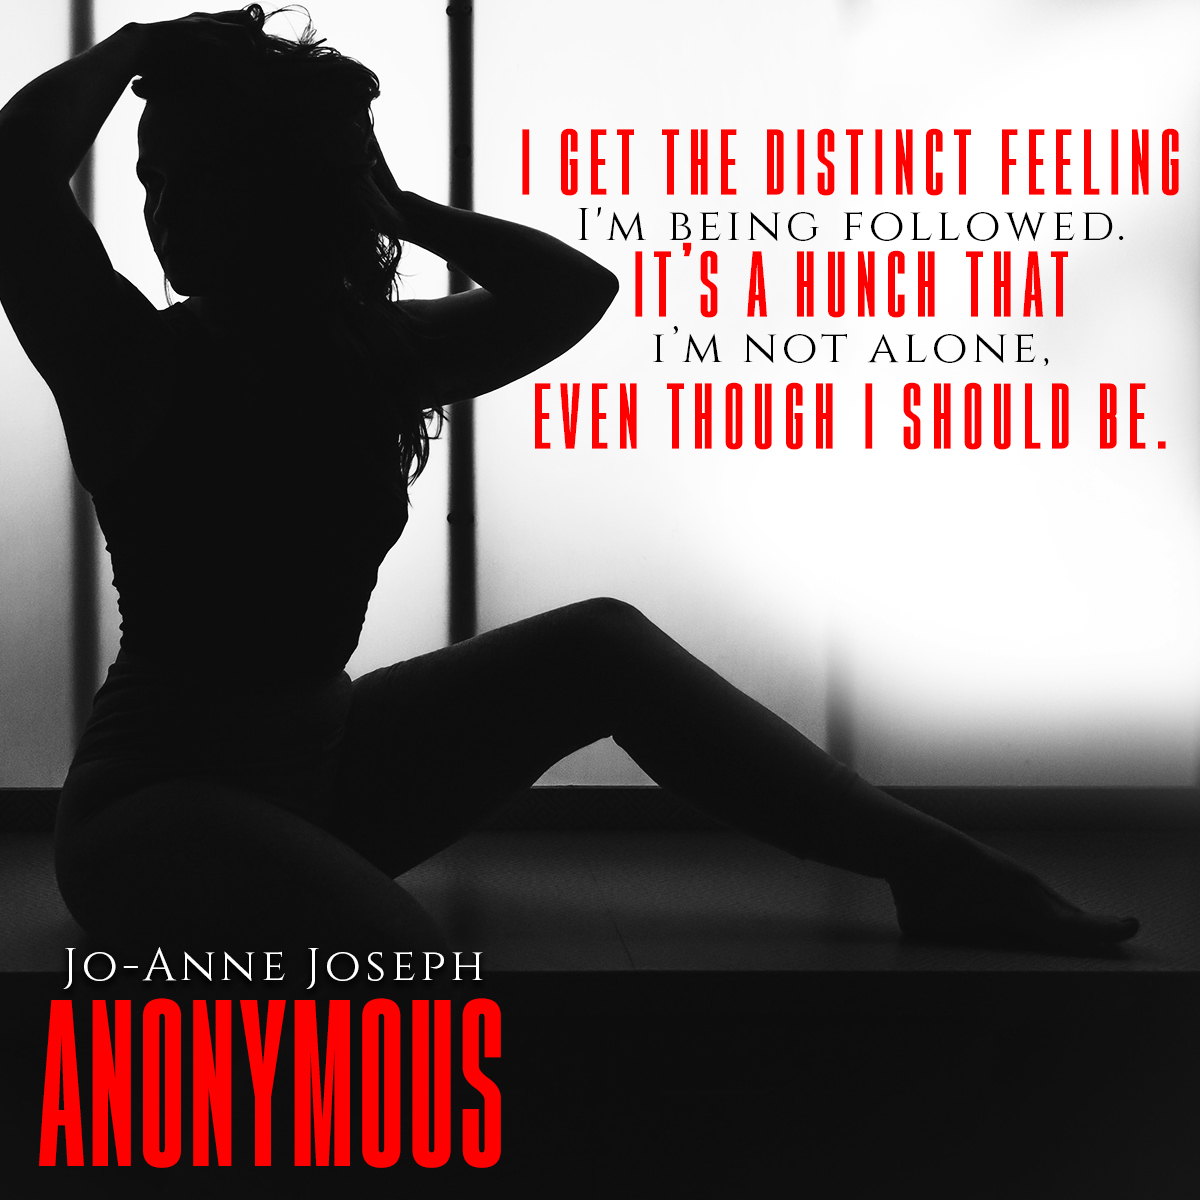 March 23 Anonymous Joseph